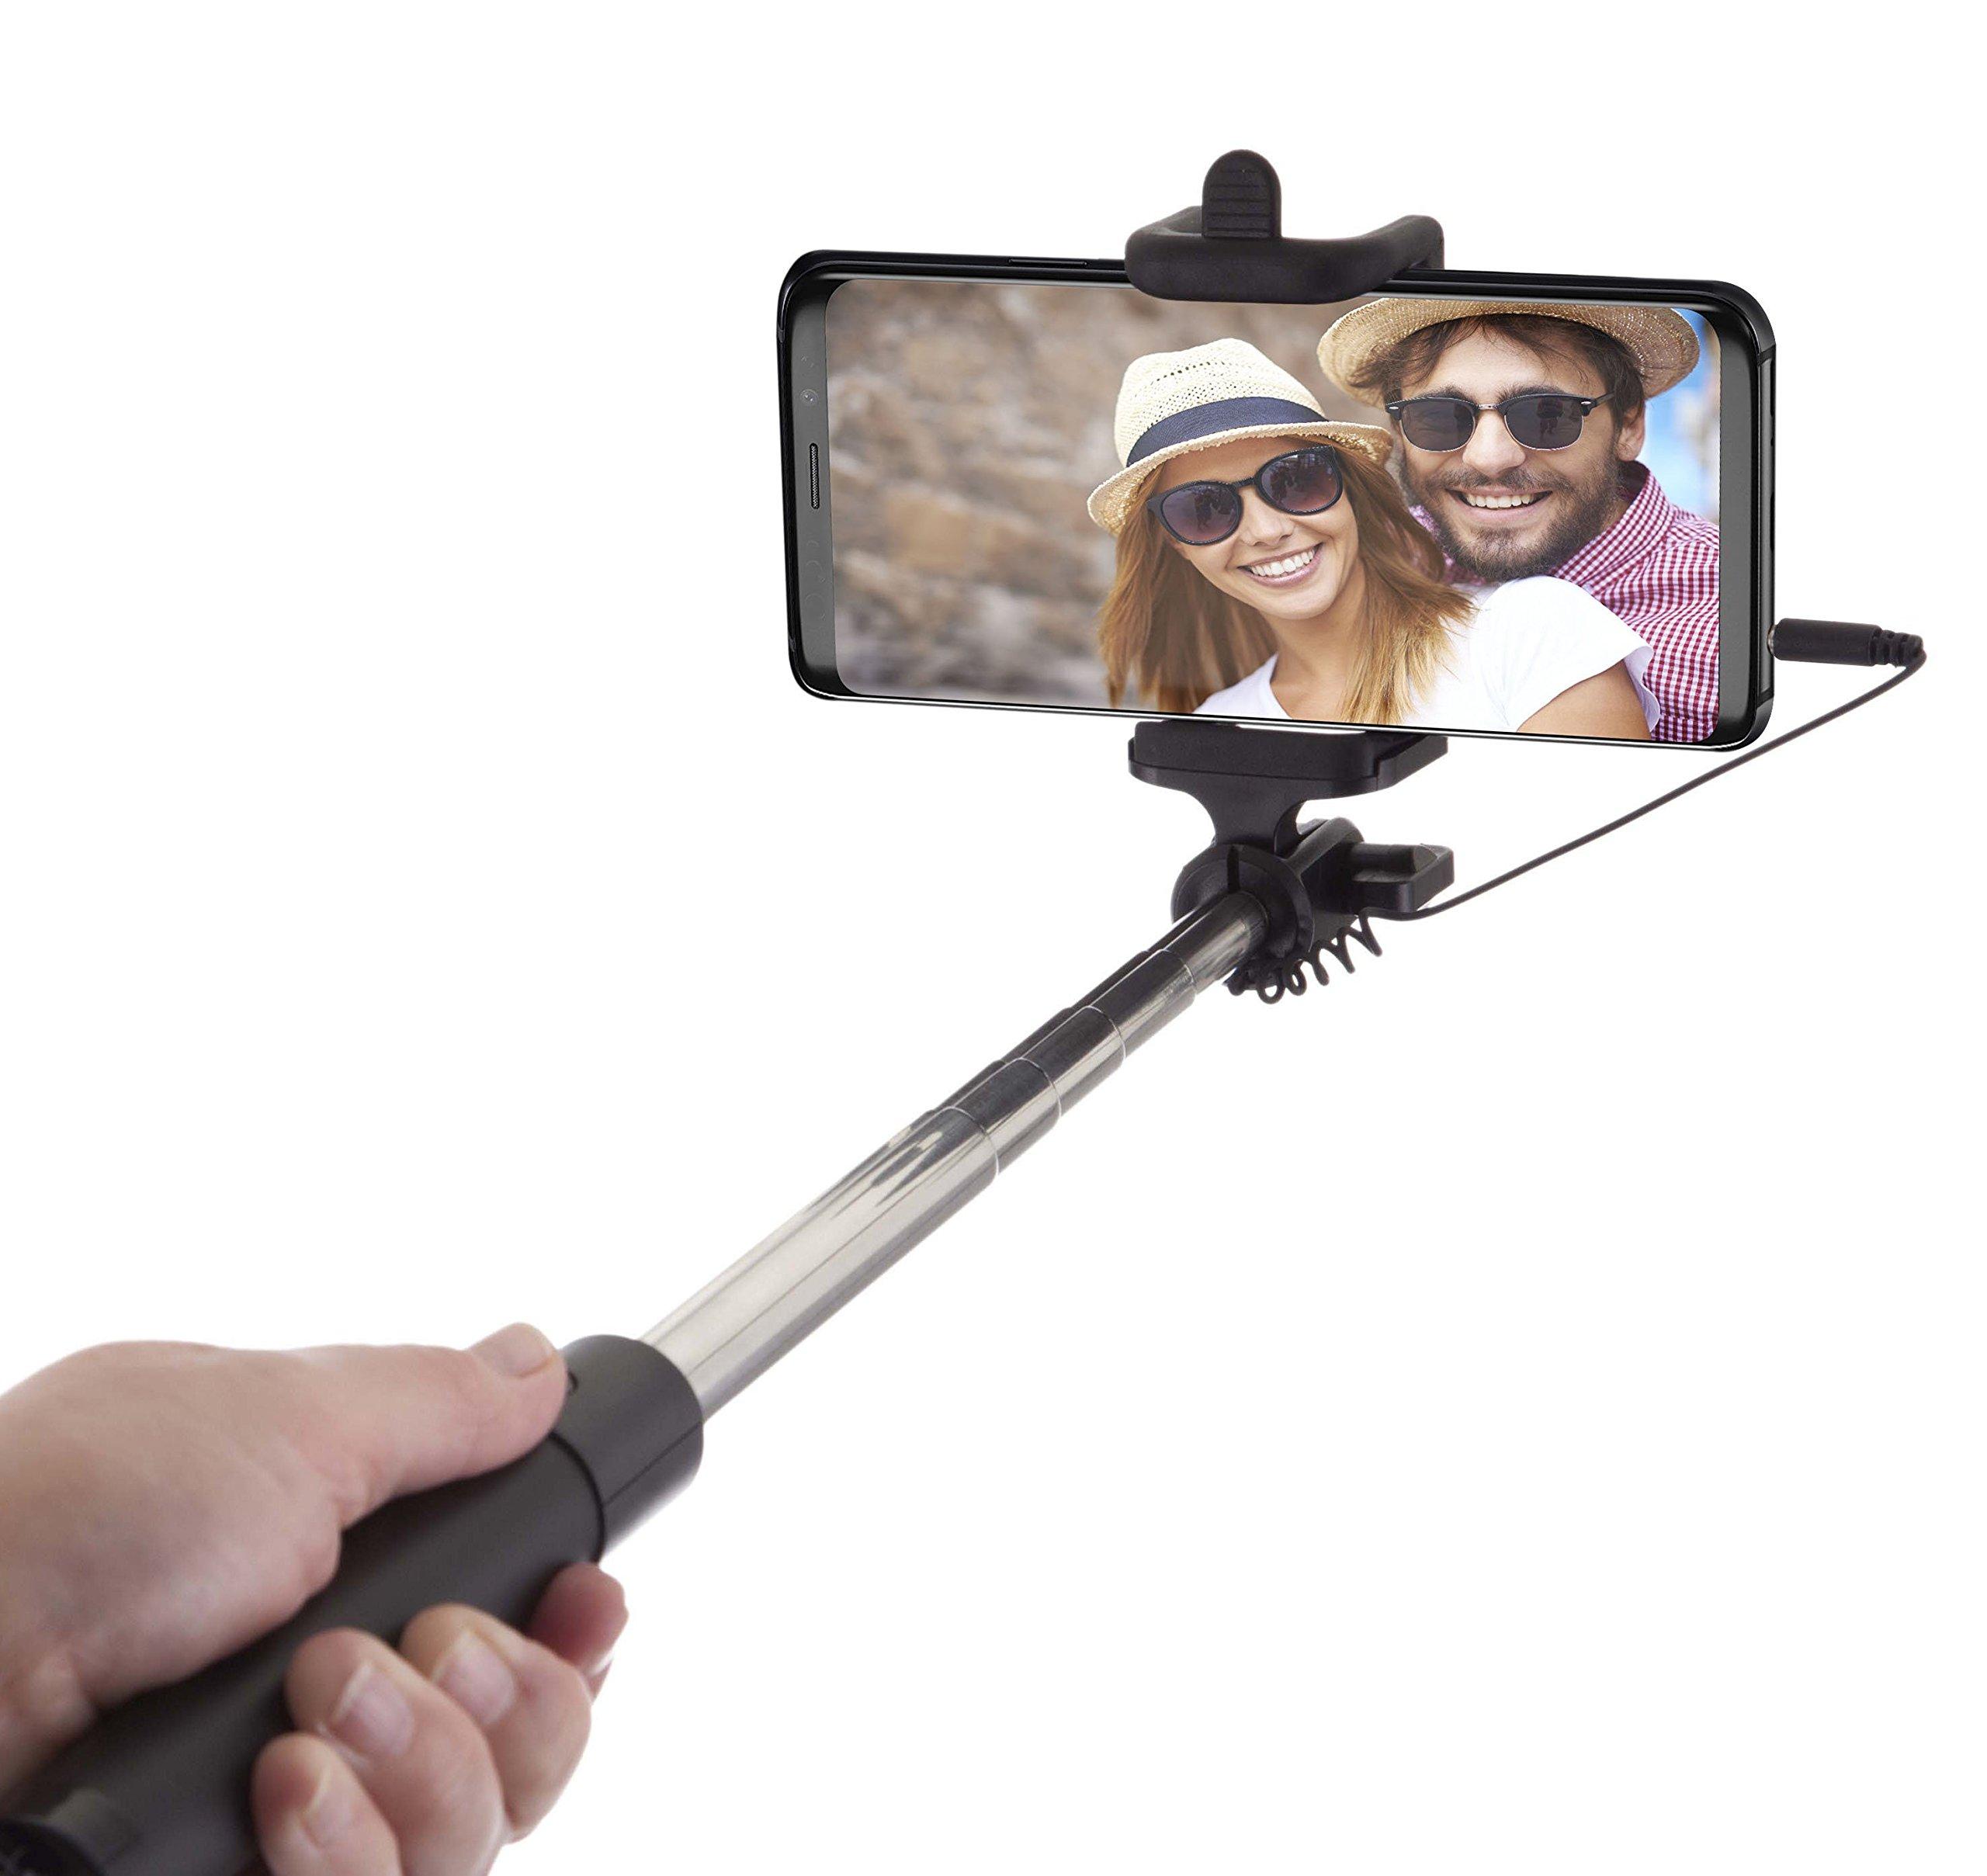 No Precisa Bater/ía ni Bluetooth Negro Power Theory Palo Selfie Stick con Cable para Tel/éfonos M/óviles Compatible con iPhone XS Max//XR//X//8//7//6S//SE y Samsung Galaxy S10//S9//S8//S7//S6 Telesc/ópico